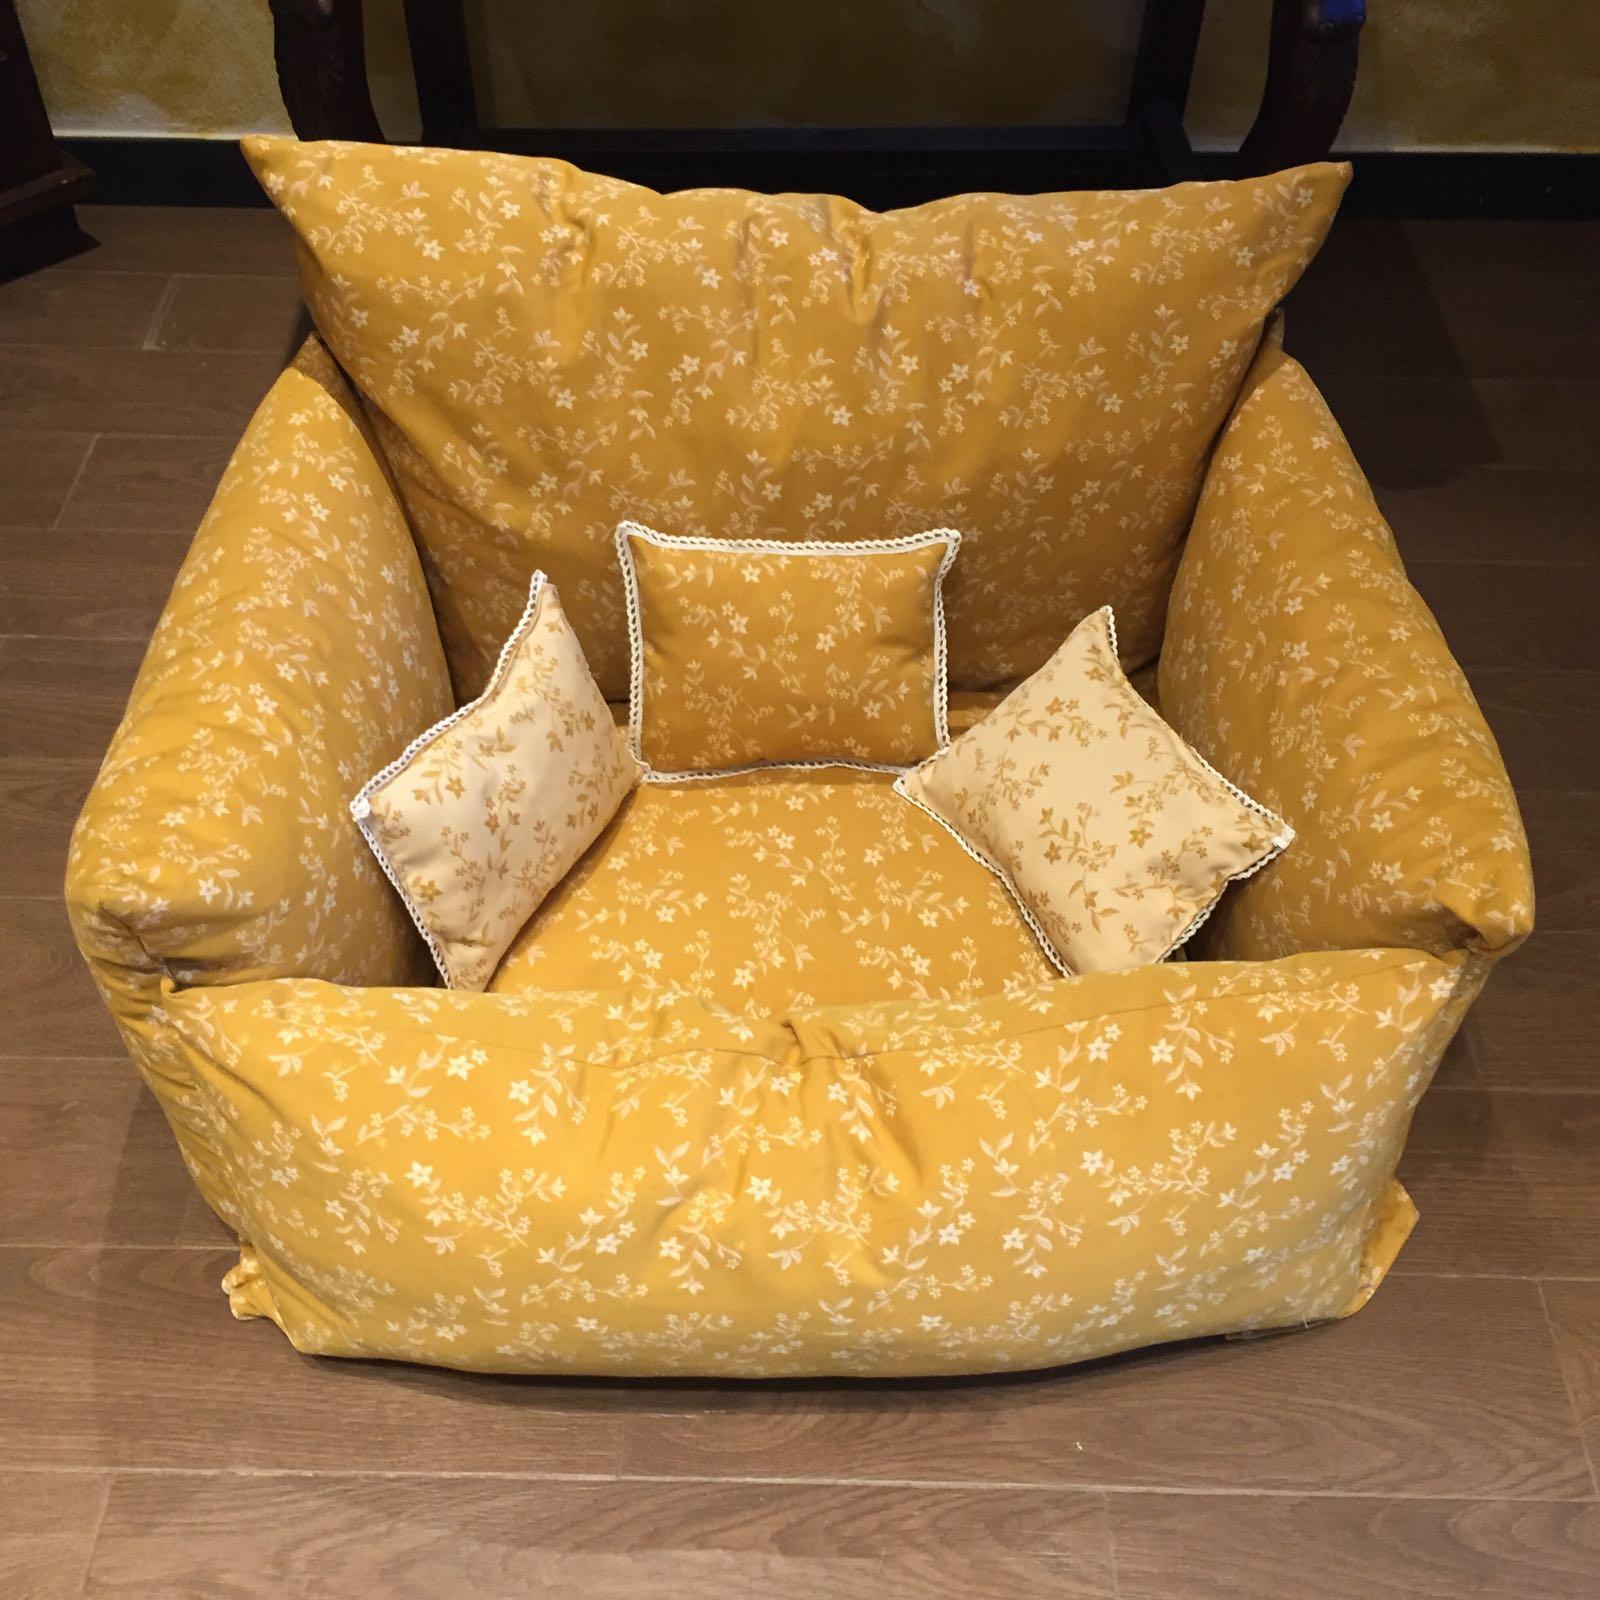 cuccia divano senape